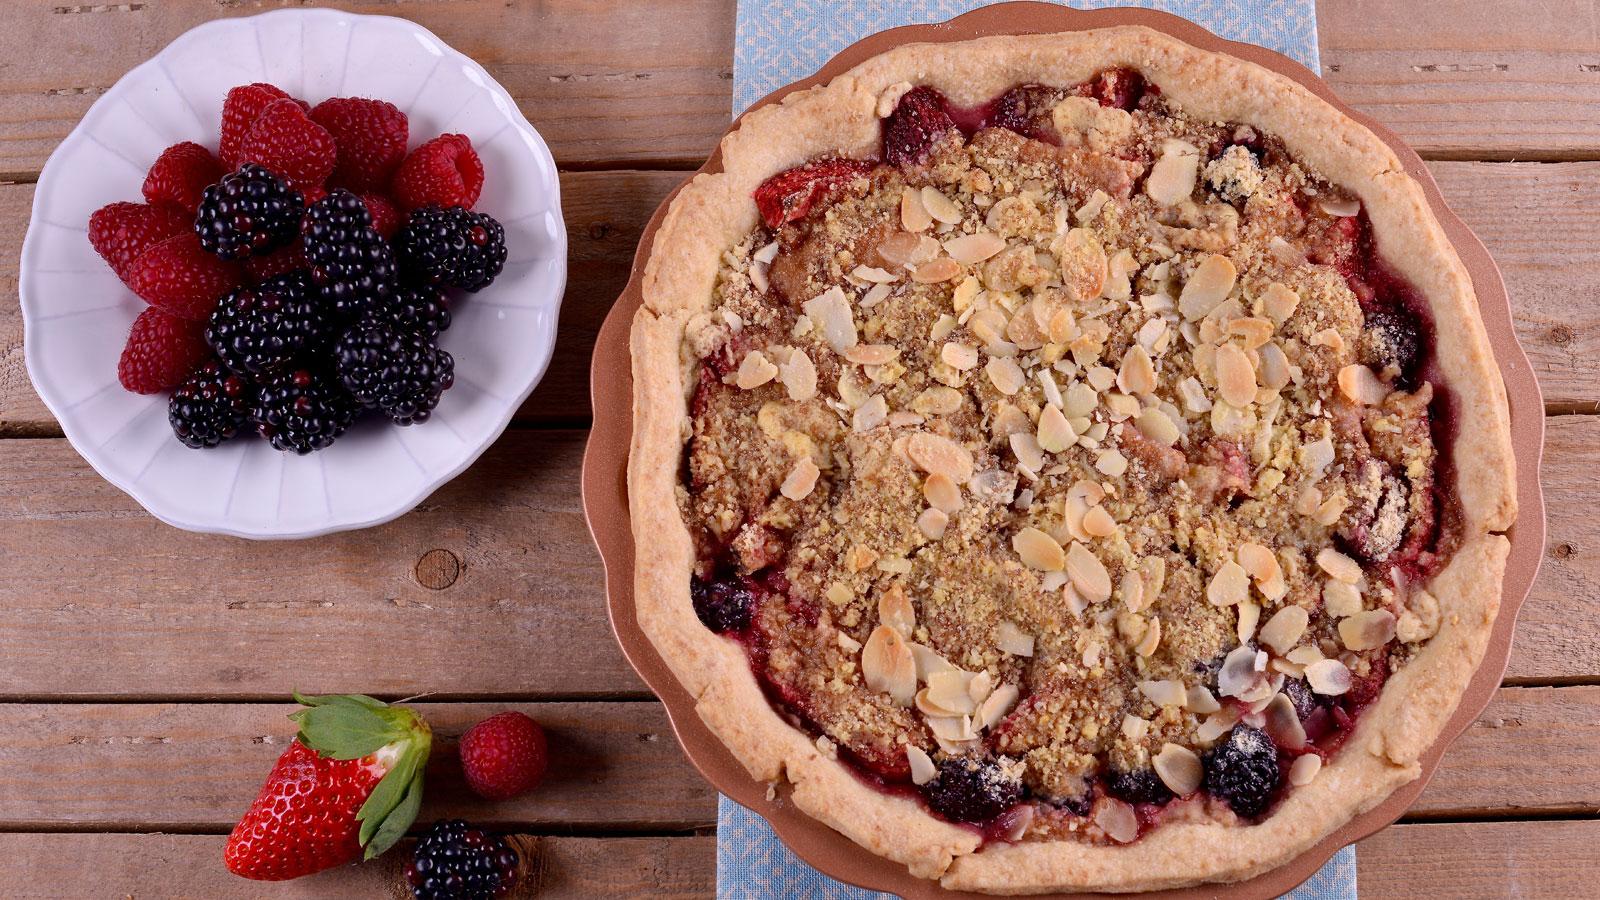 Tartaleta de frutos rojos y fresas alma obreg n receta canal cocina - Canal cocina alma obregon ...